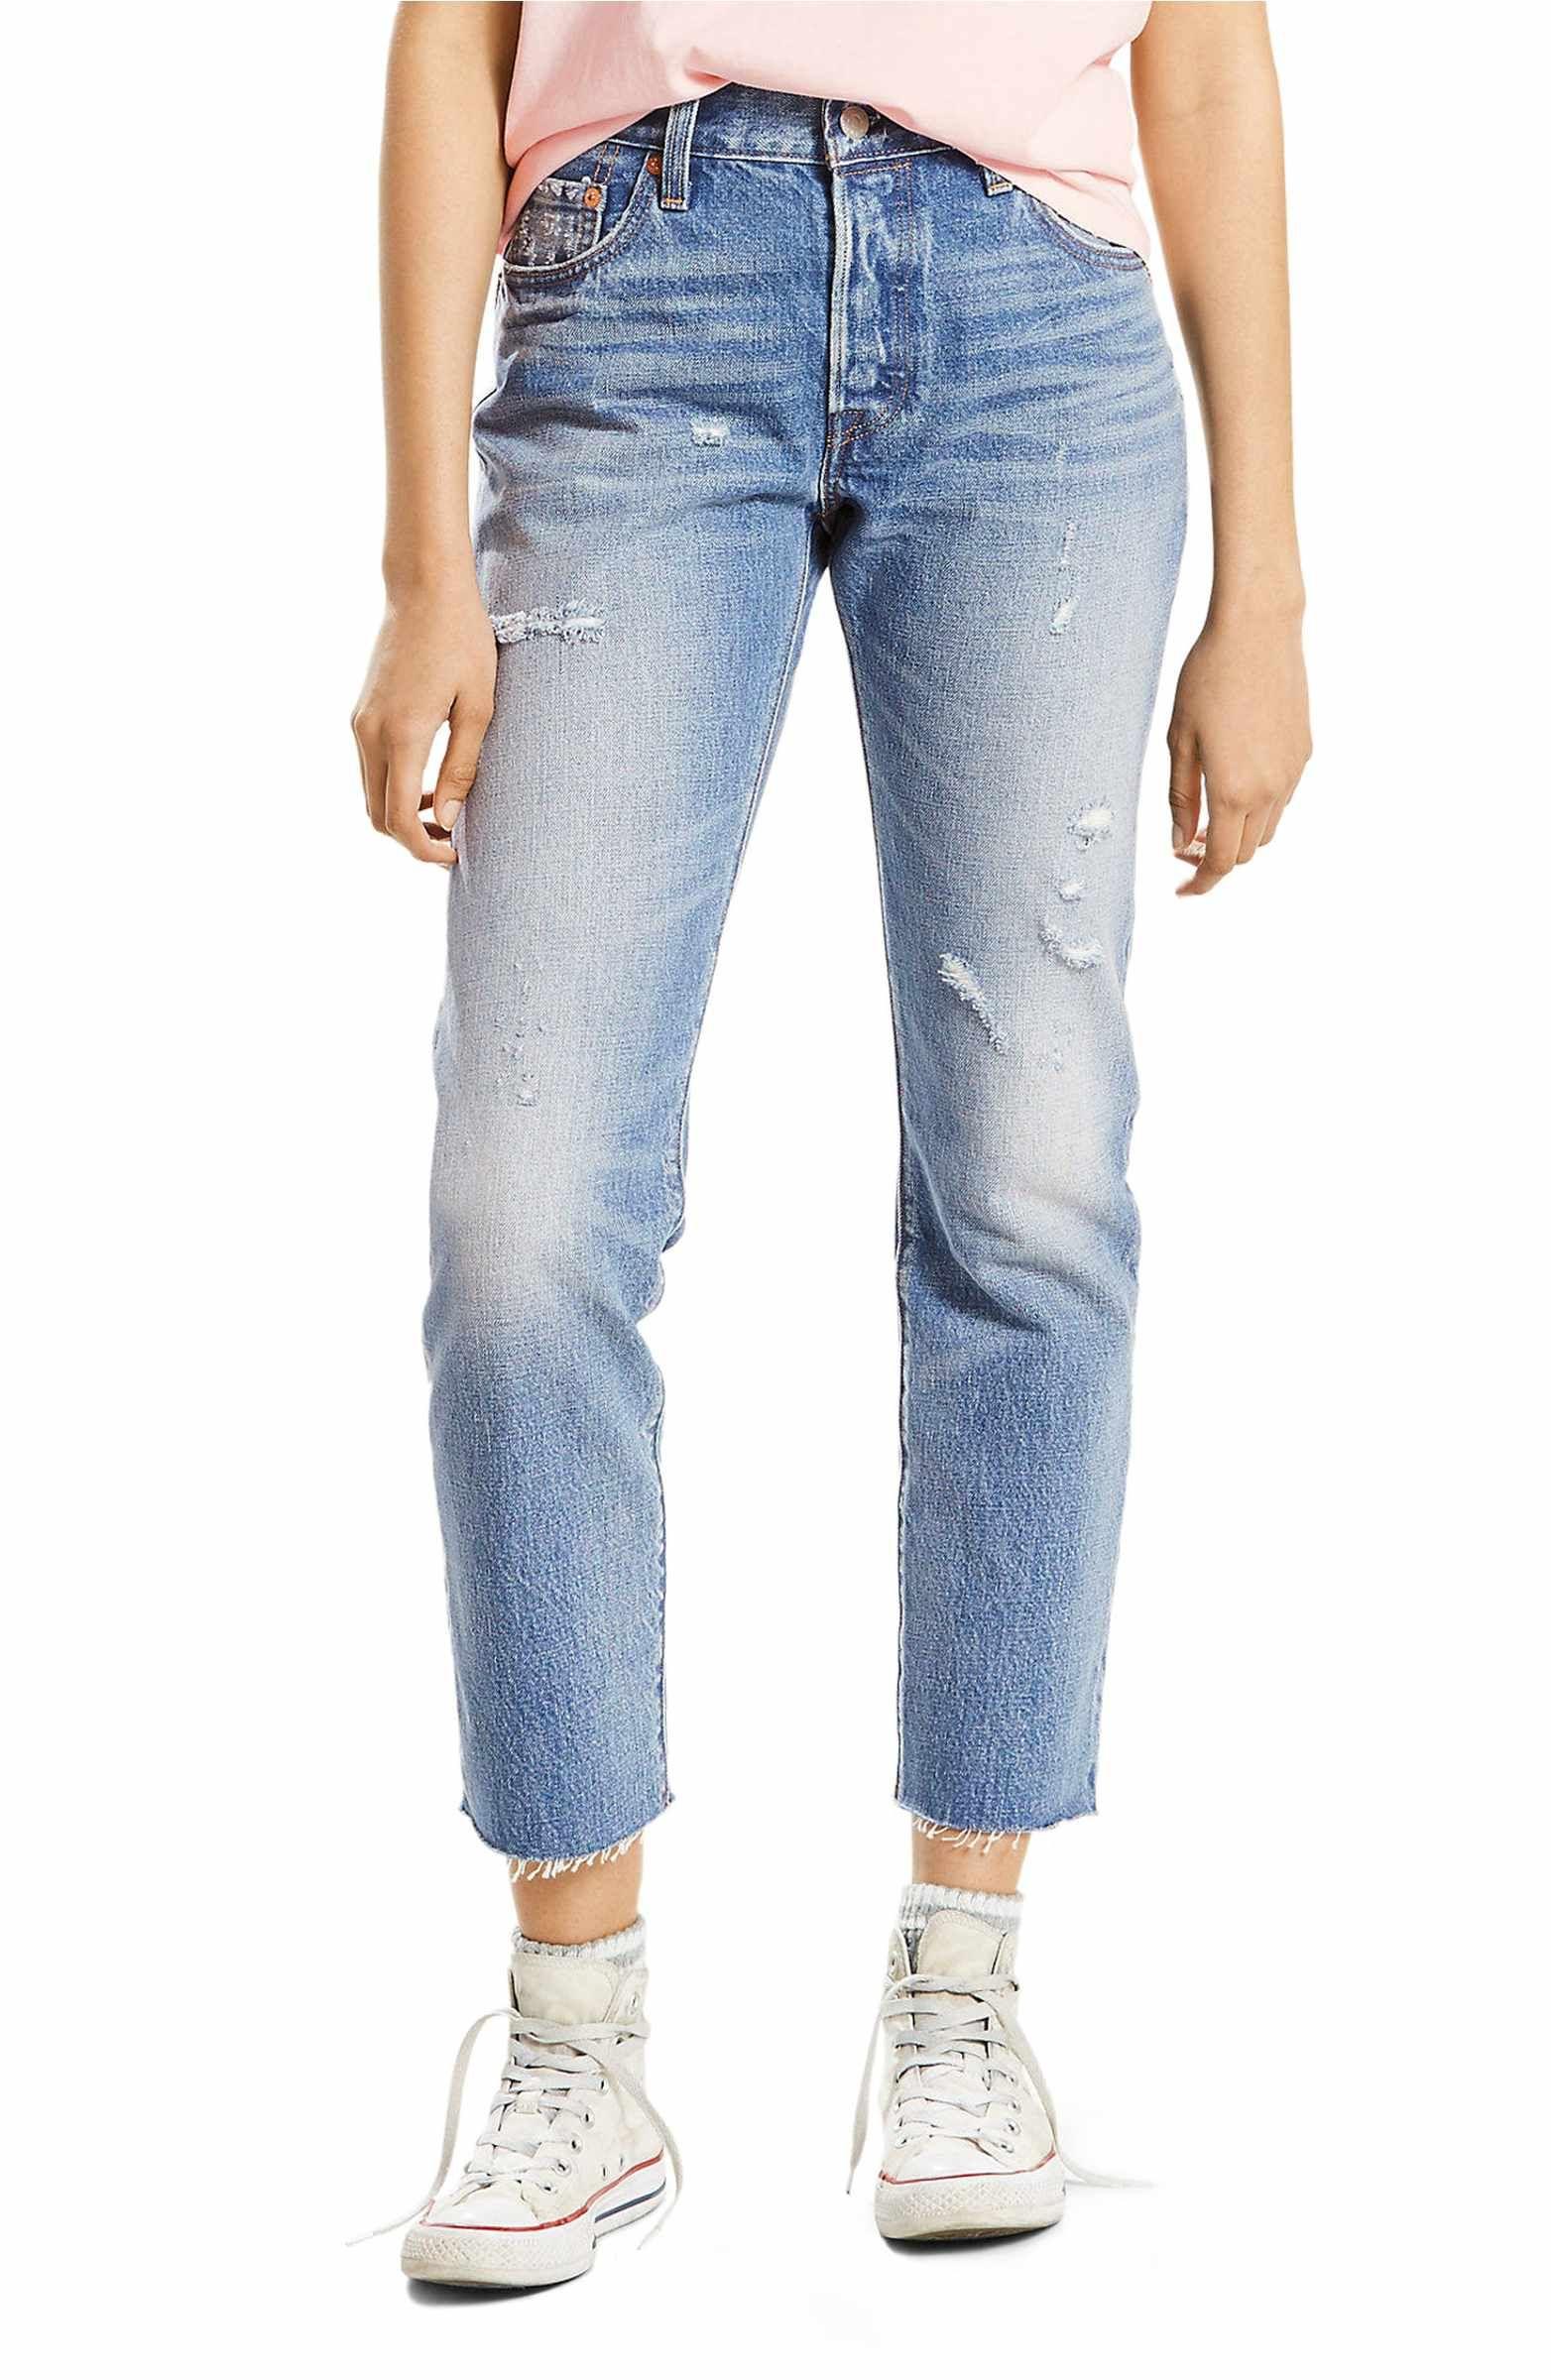 Main image levis 501 high waist straight leg jeans